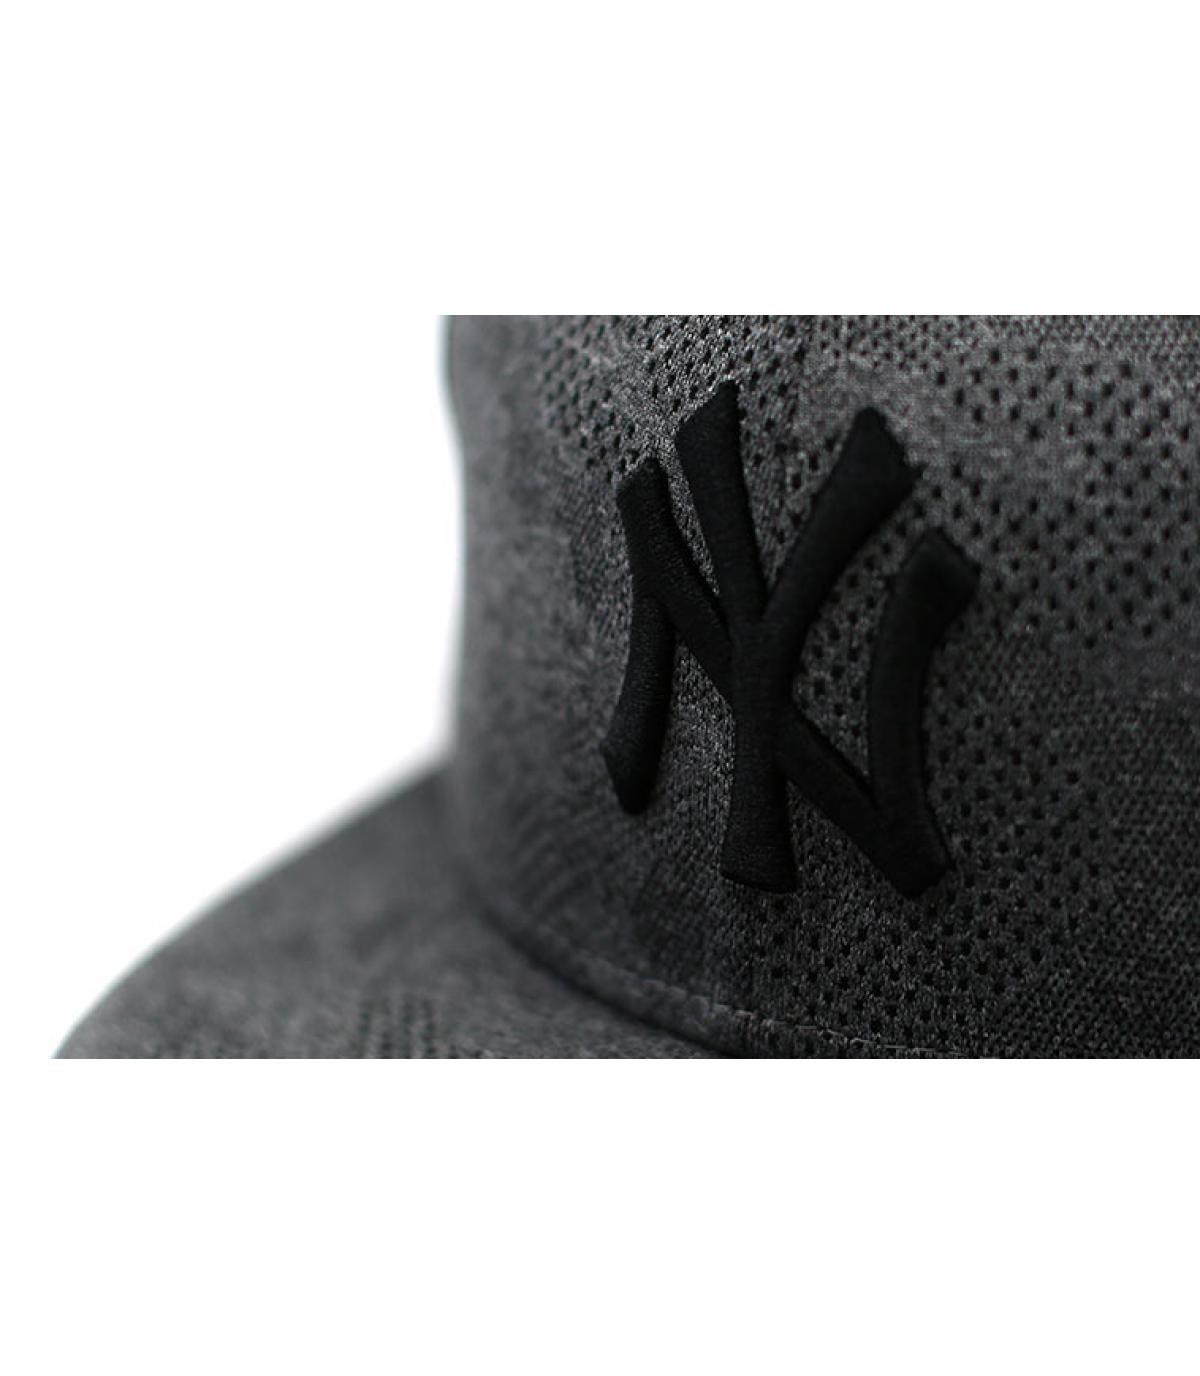 Detalles Engineered Plus NY 950 gray black imagen 3